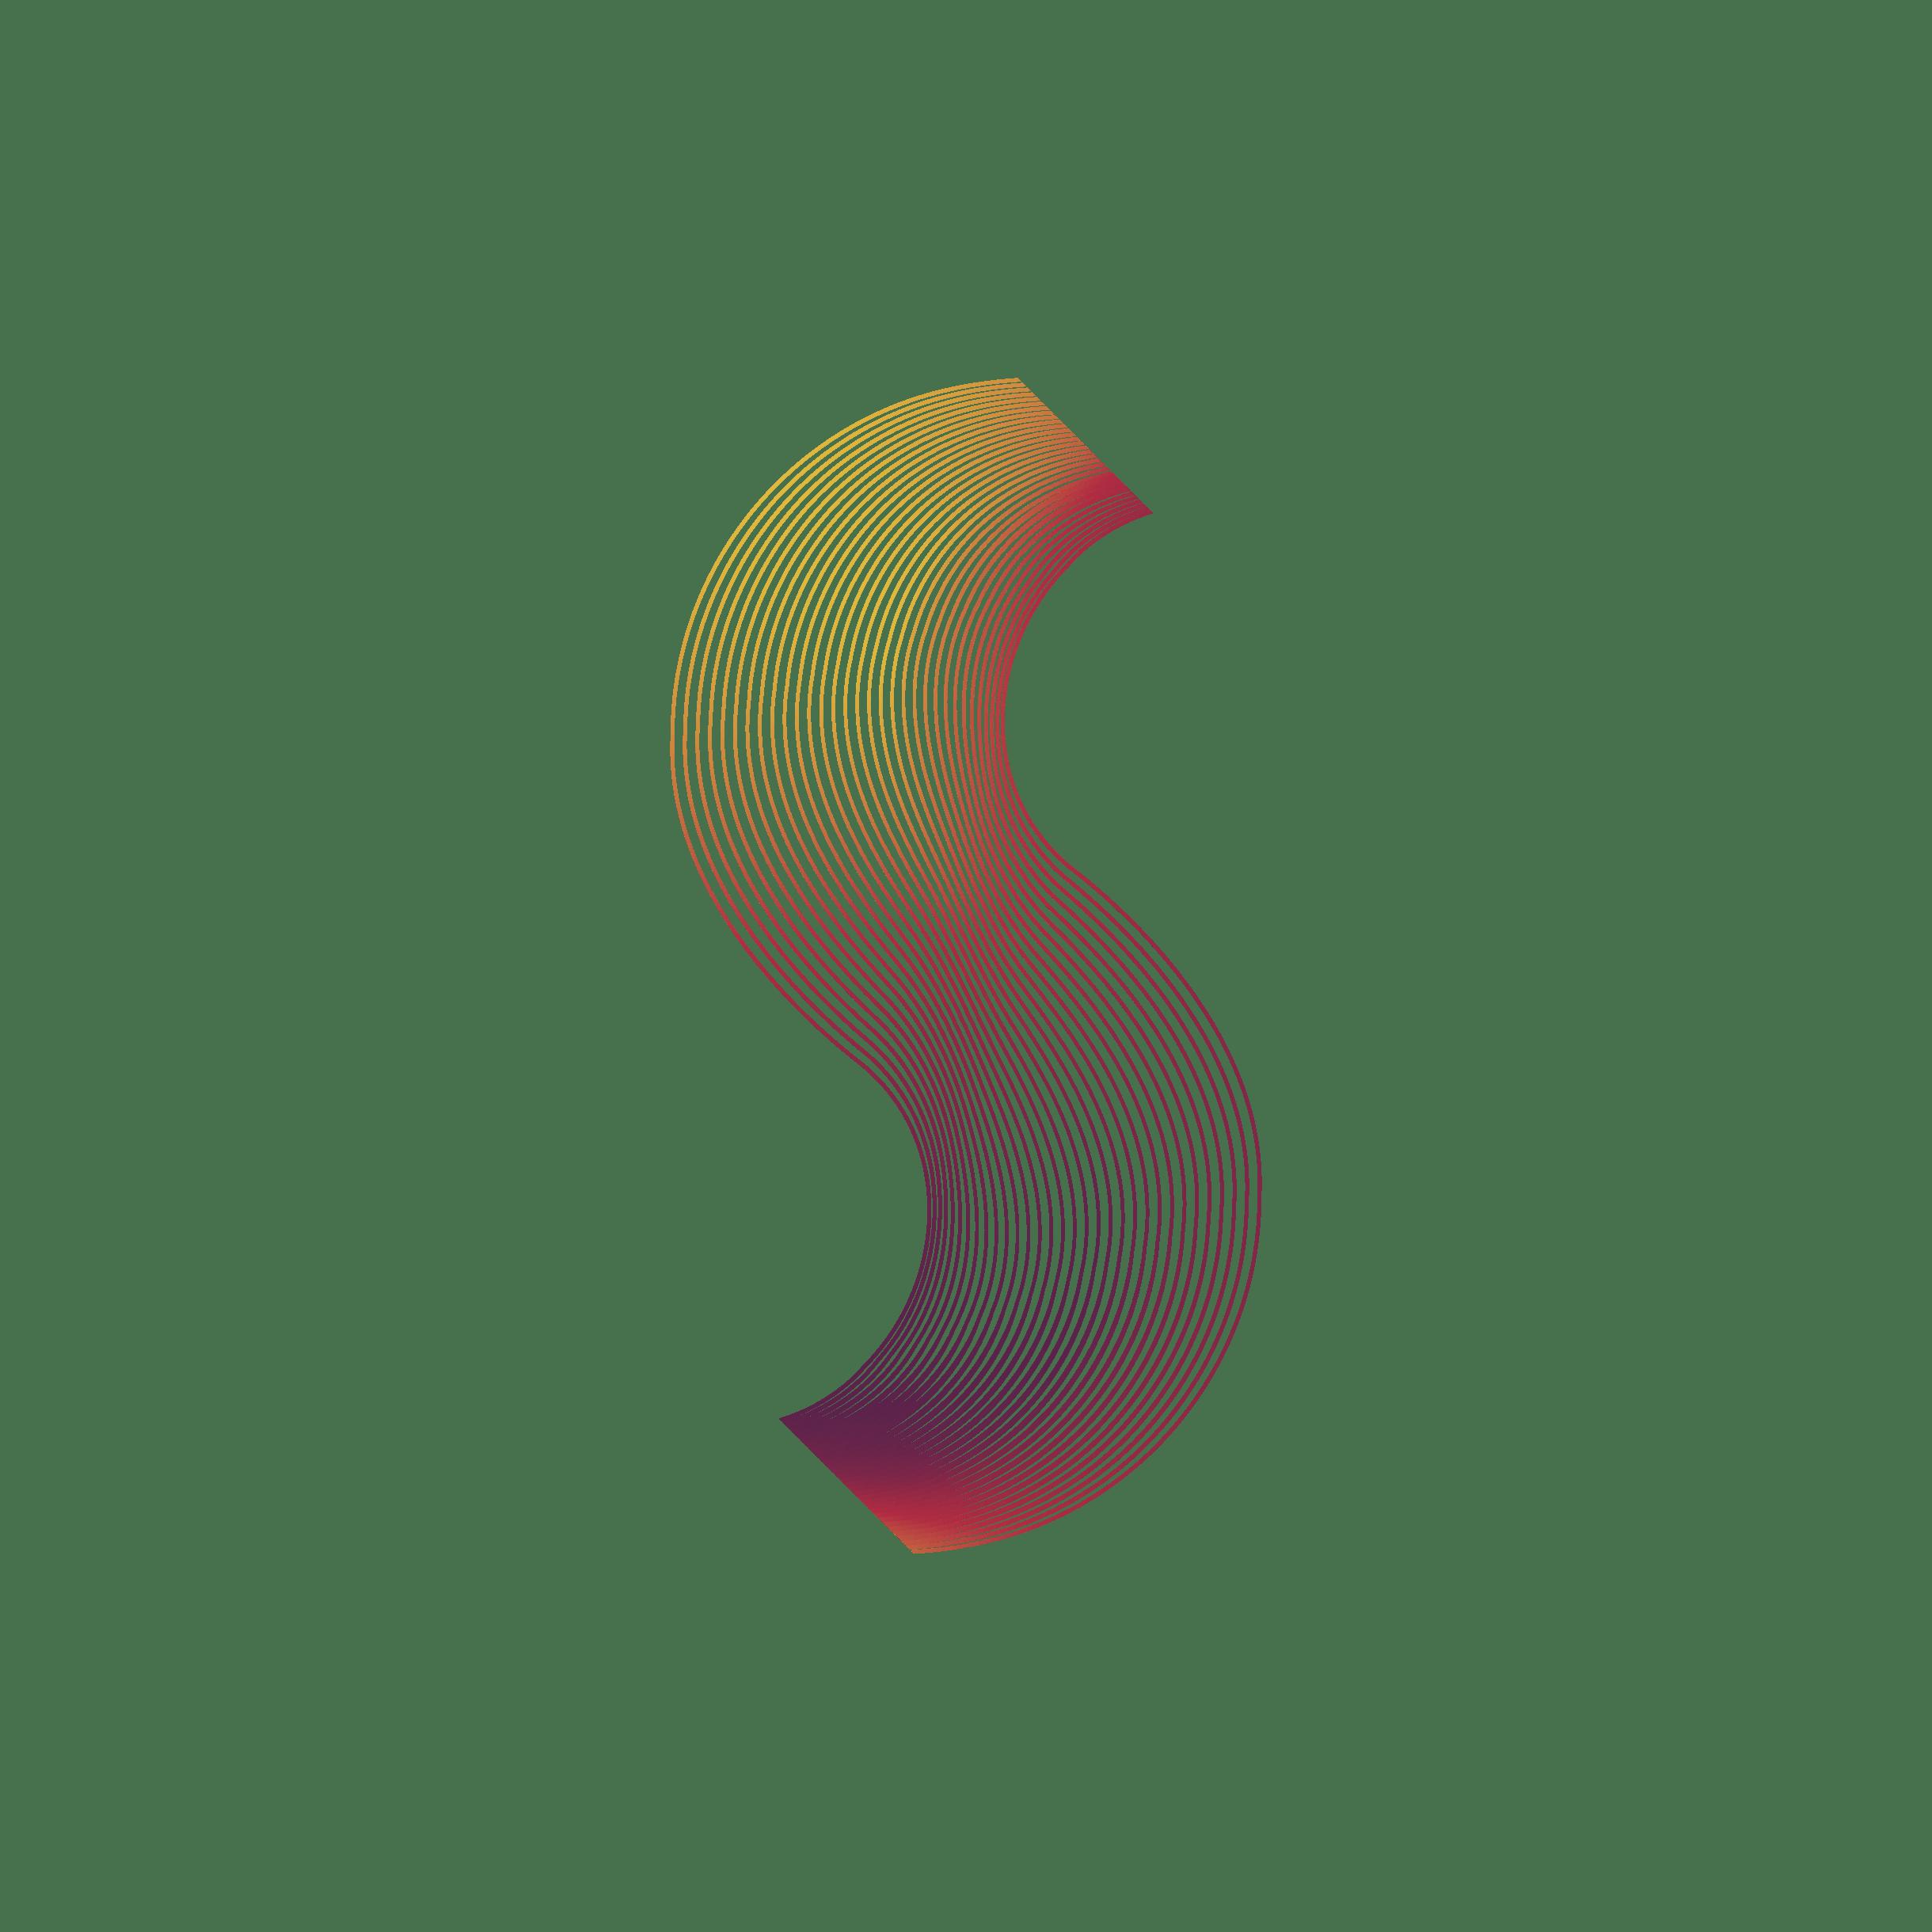 graphic_element_3